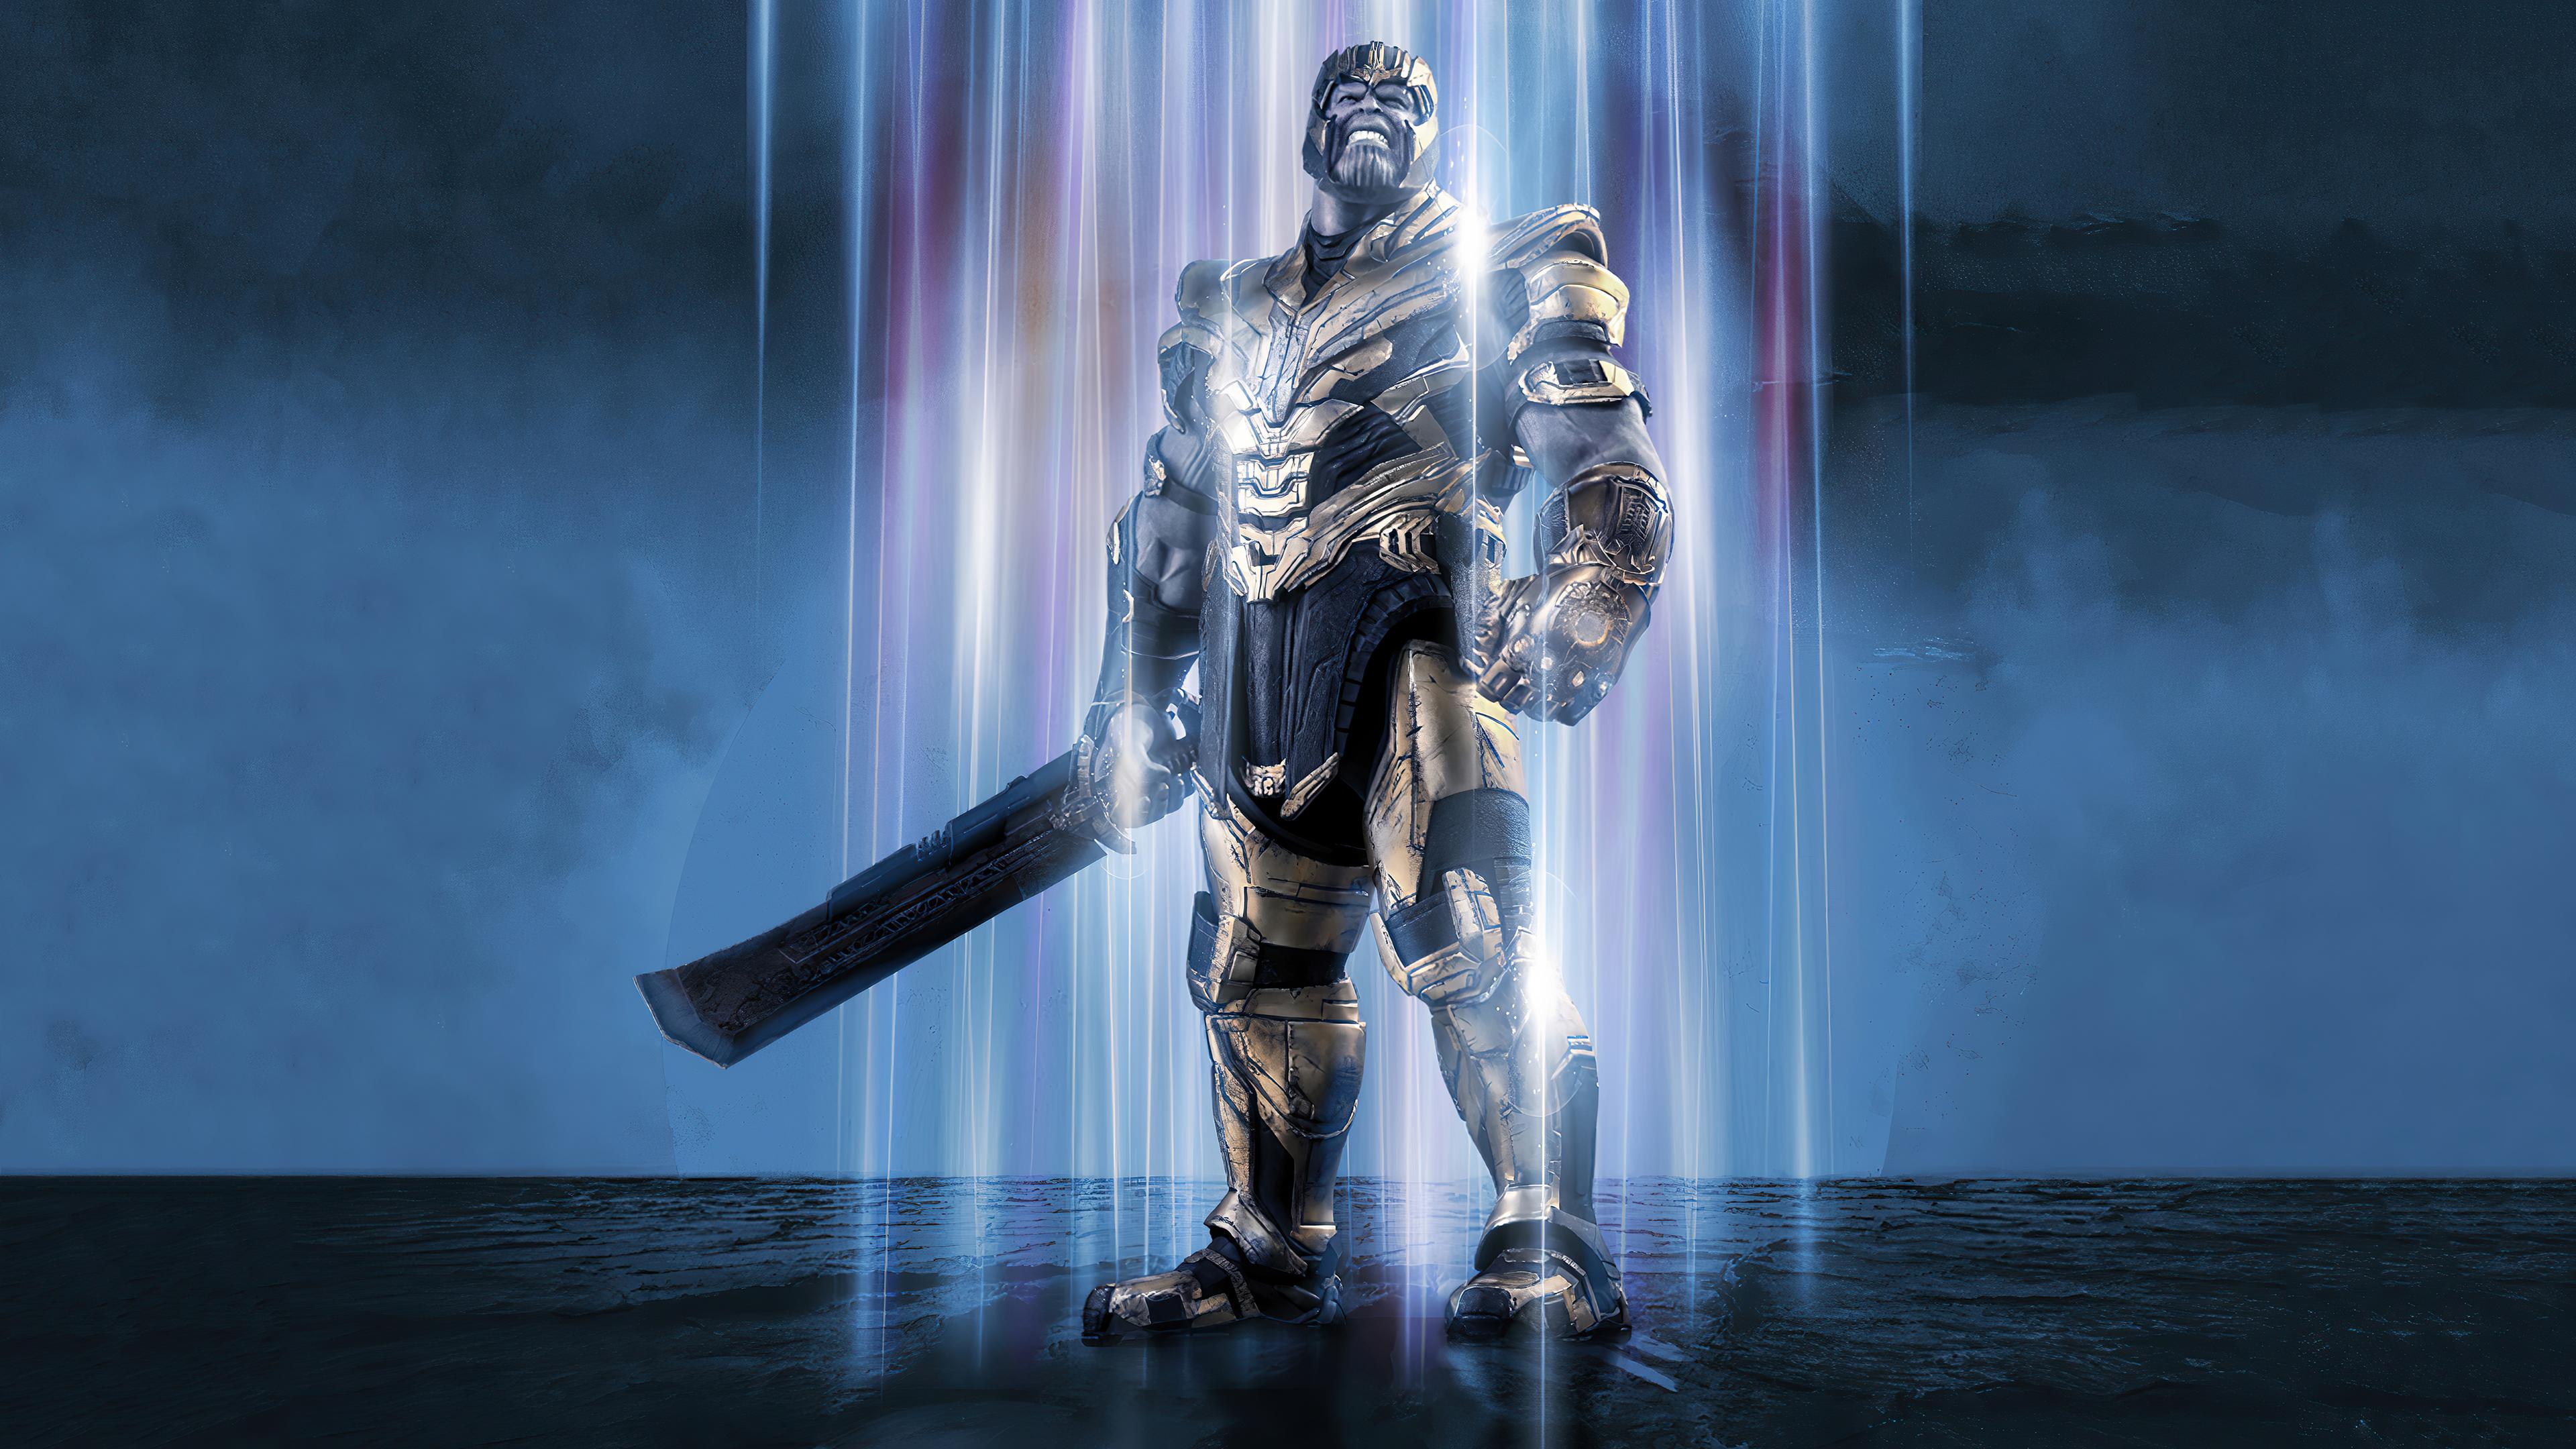 thanos i am inevitable 4k 1619216301 - Thanos I Am Inevitable 4k - Thanos I Am Inevitable 4k wallpapers